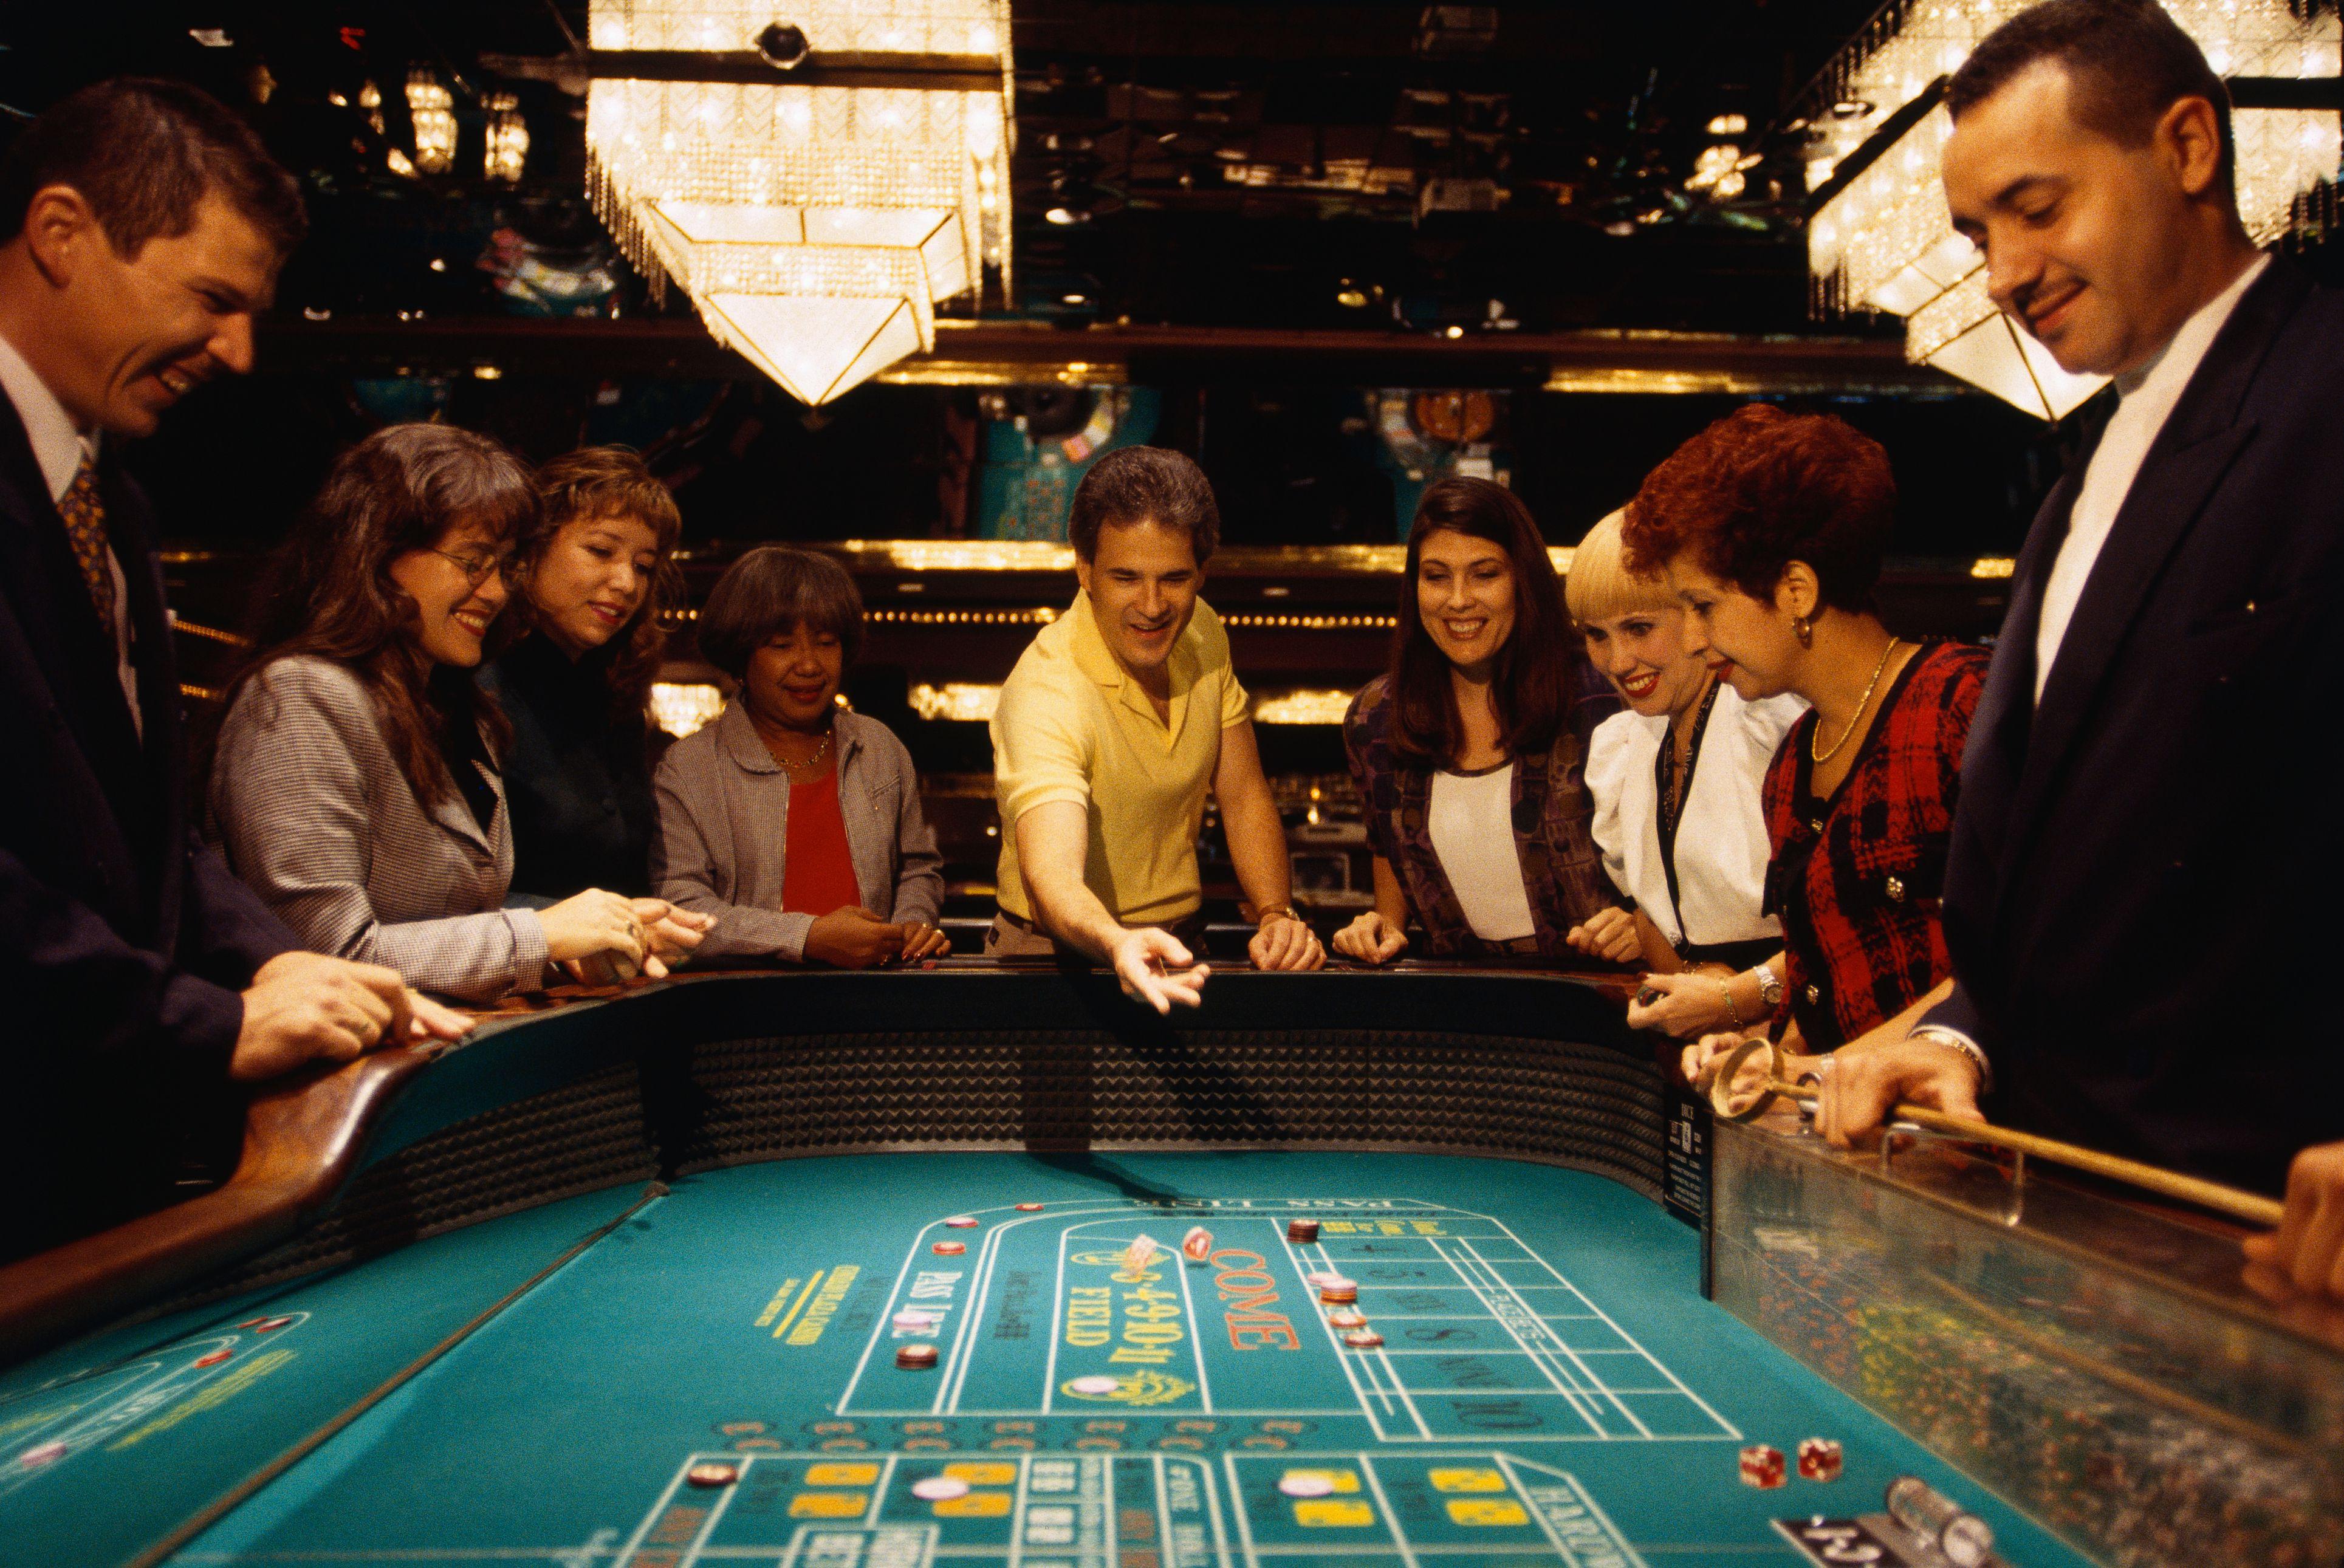 Slot machines for fun